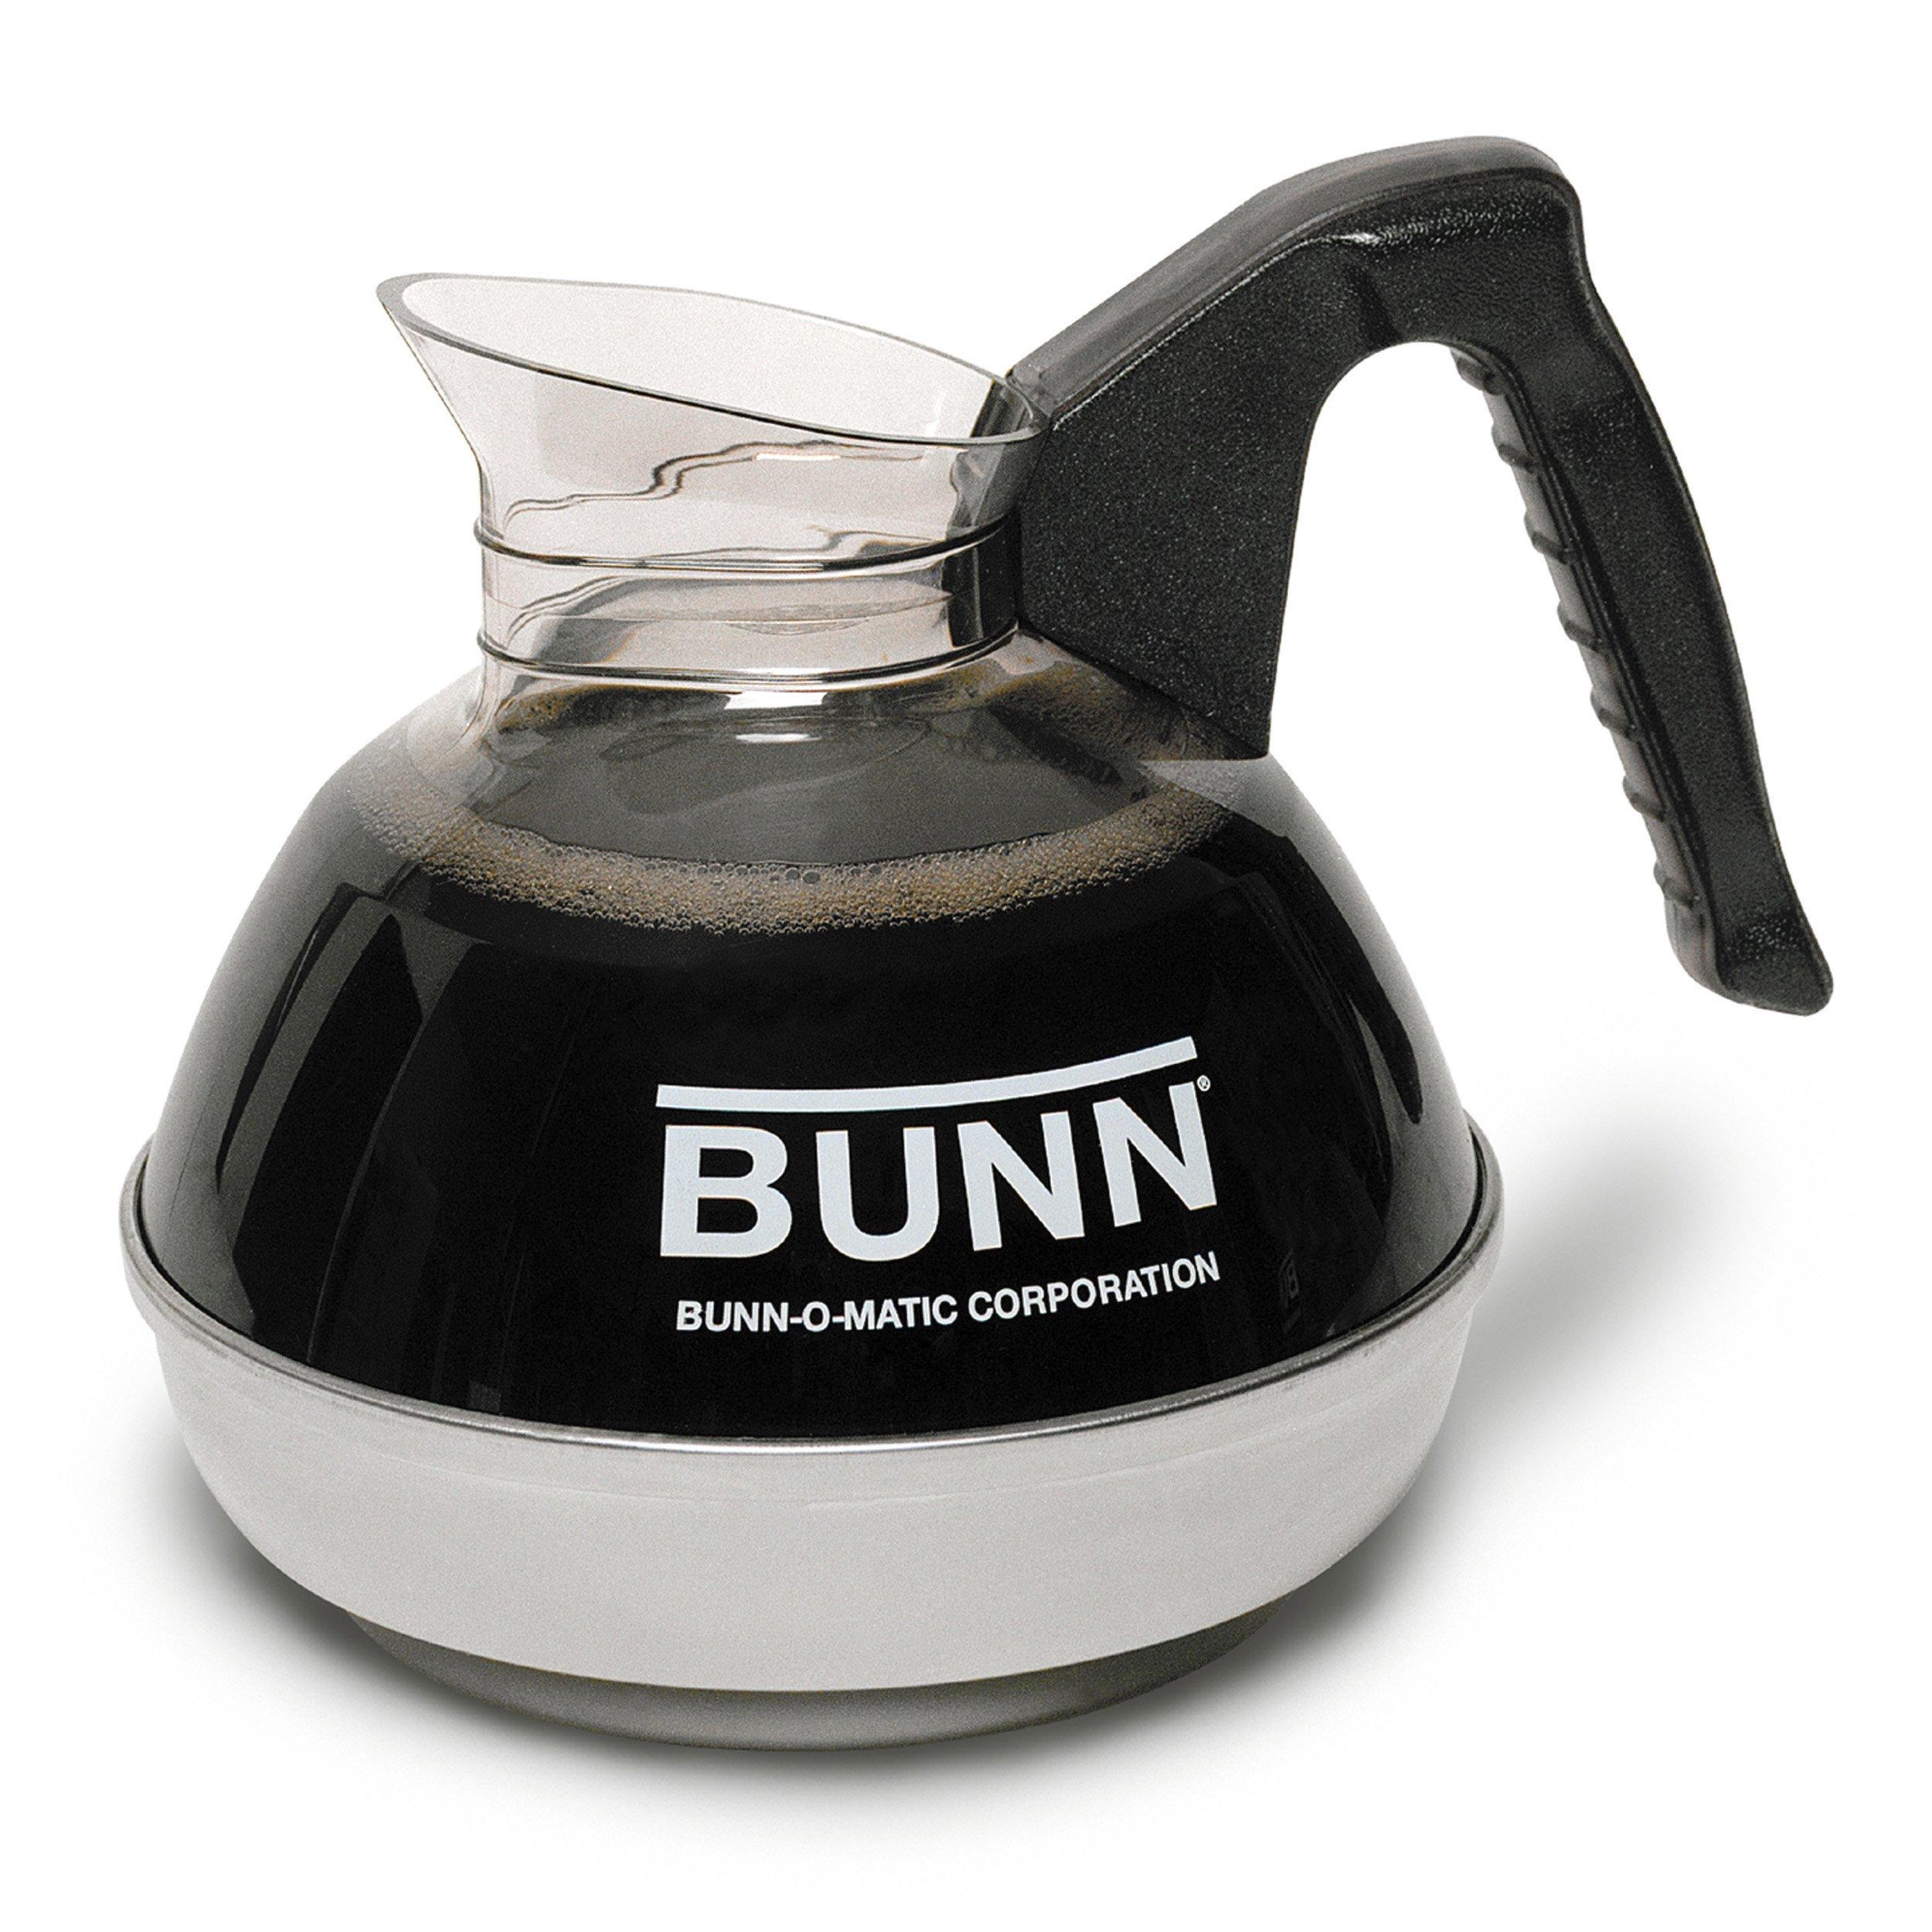 BUNN 6100 Easy Pour Replacement Decanter, Black by BUNN